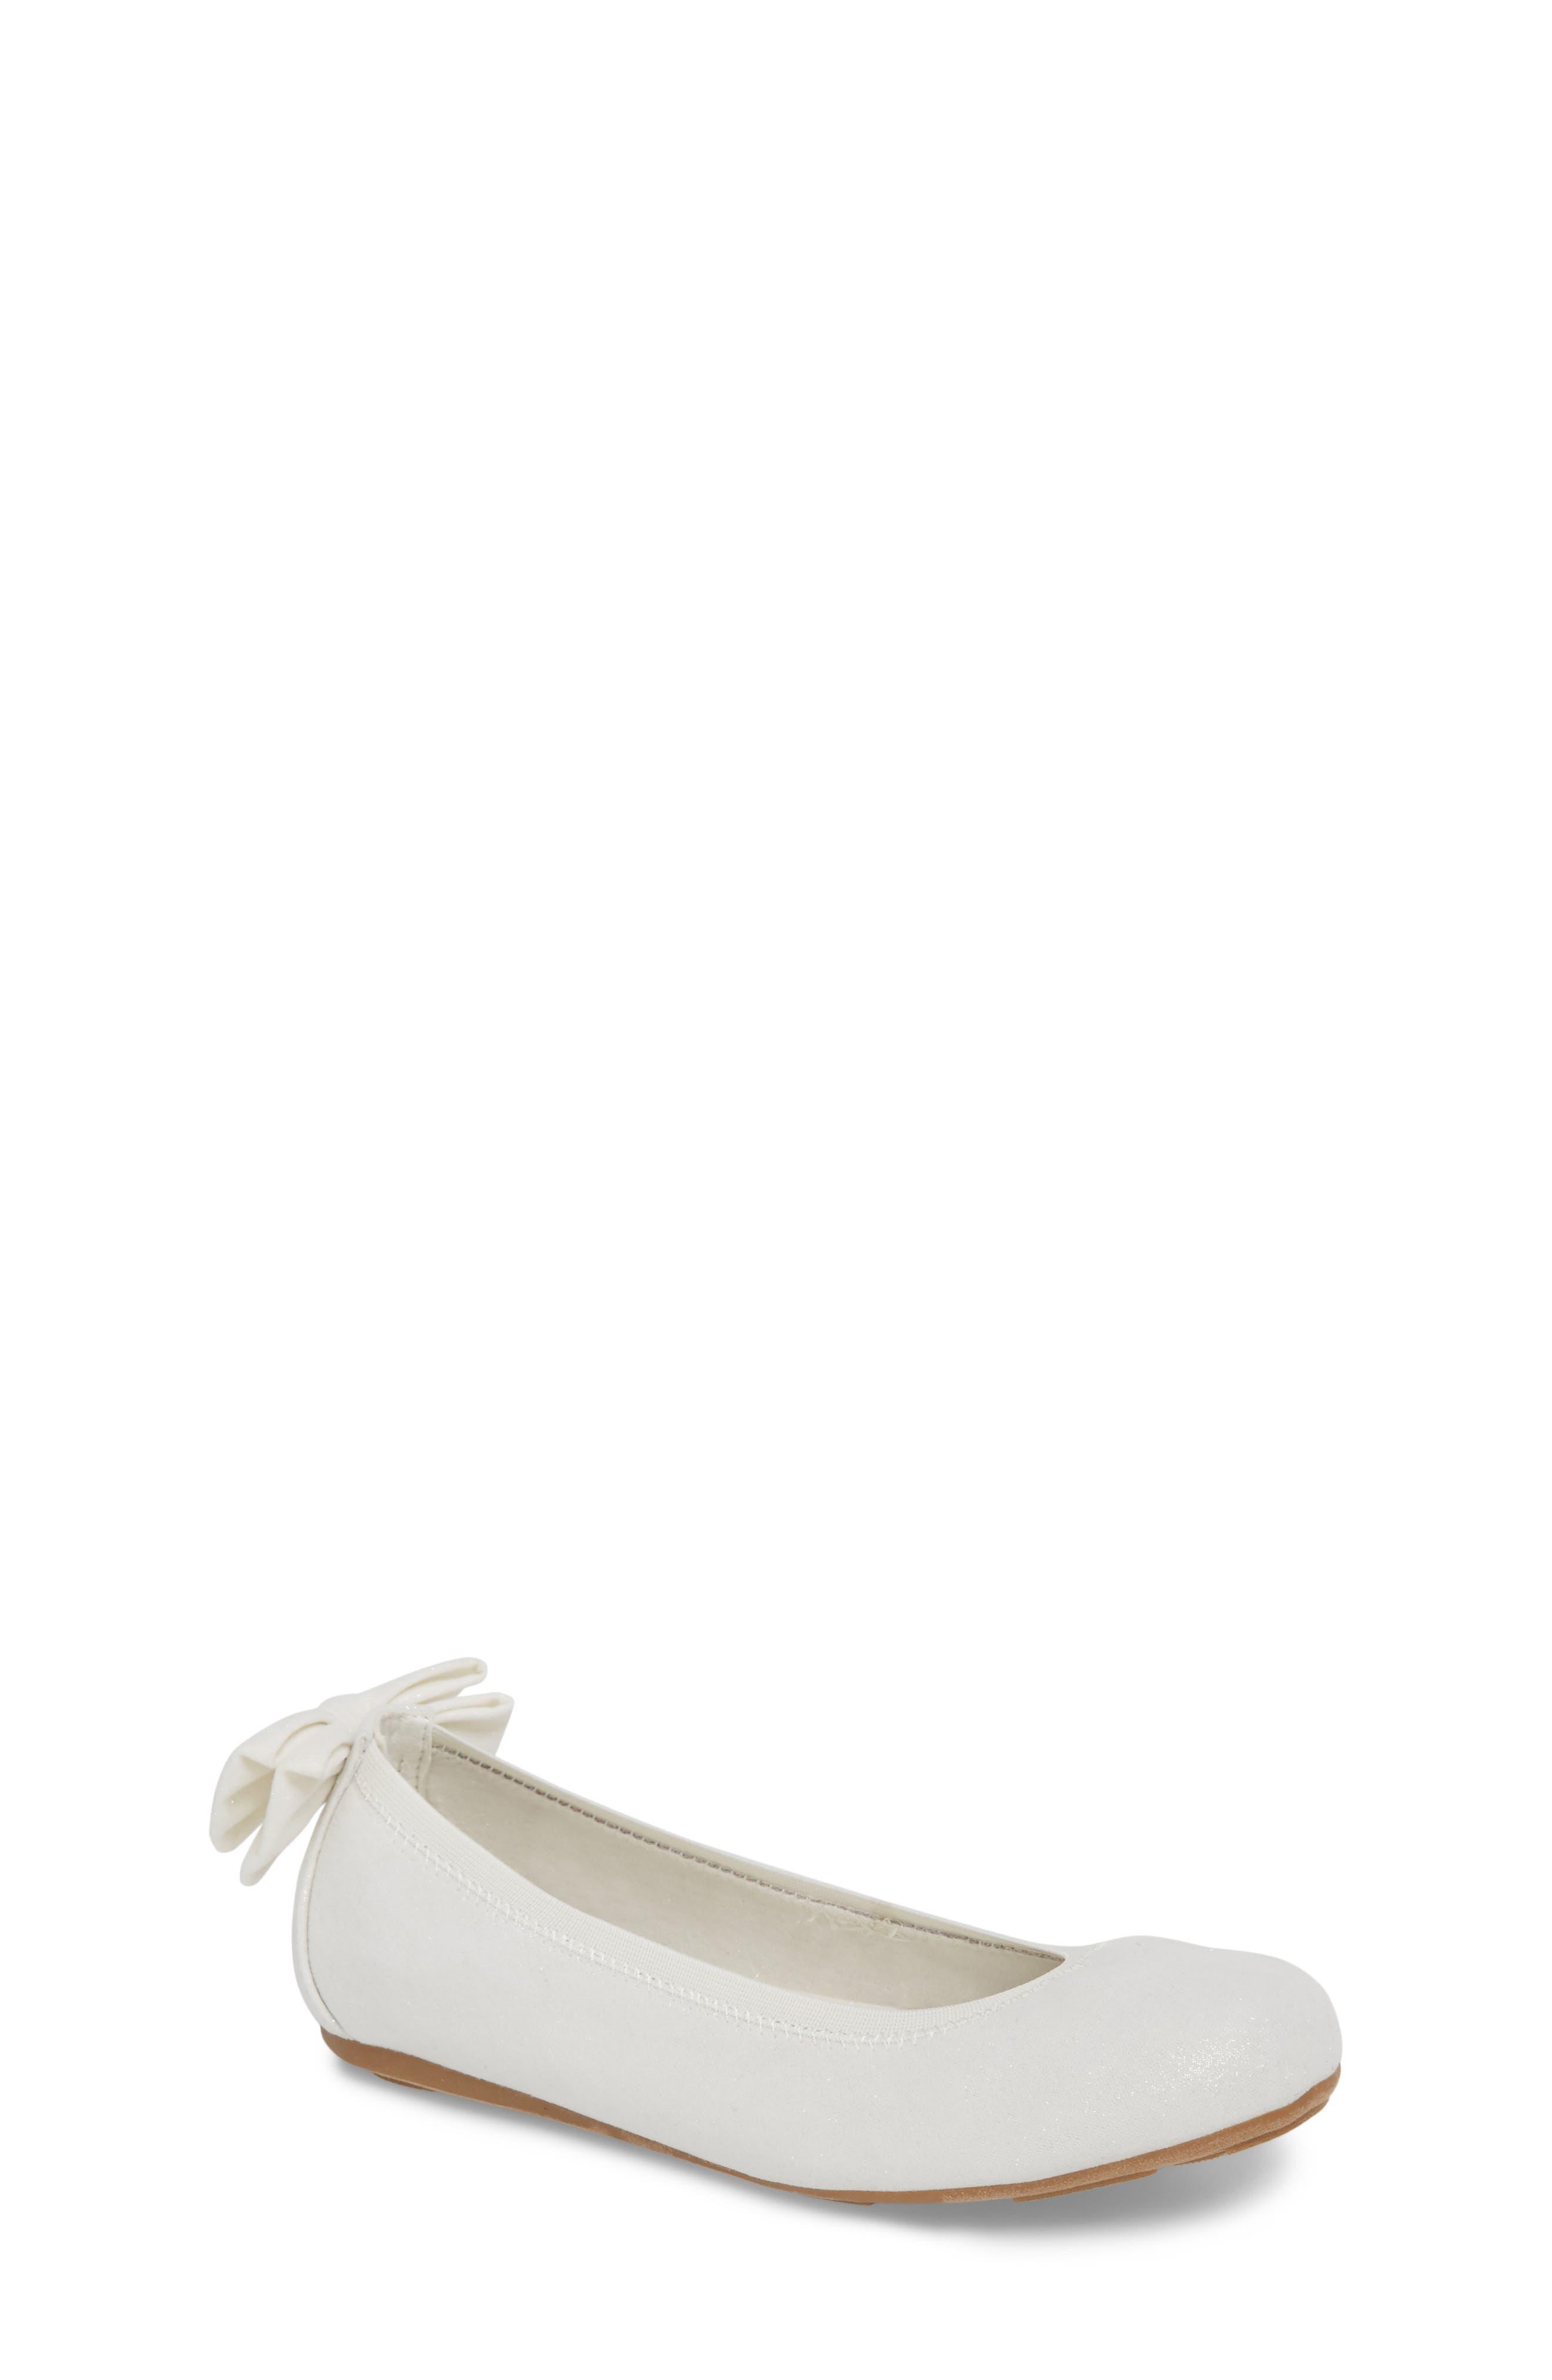 Stuart Weiztman Fannie Elena Glitter Ballet Flat (Toddler, Little Kid & Big Kid)